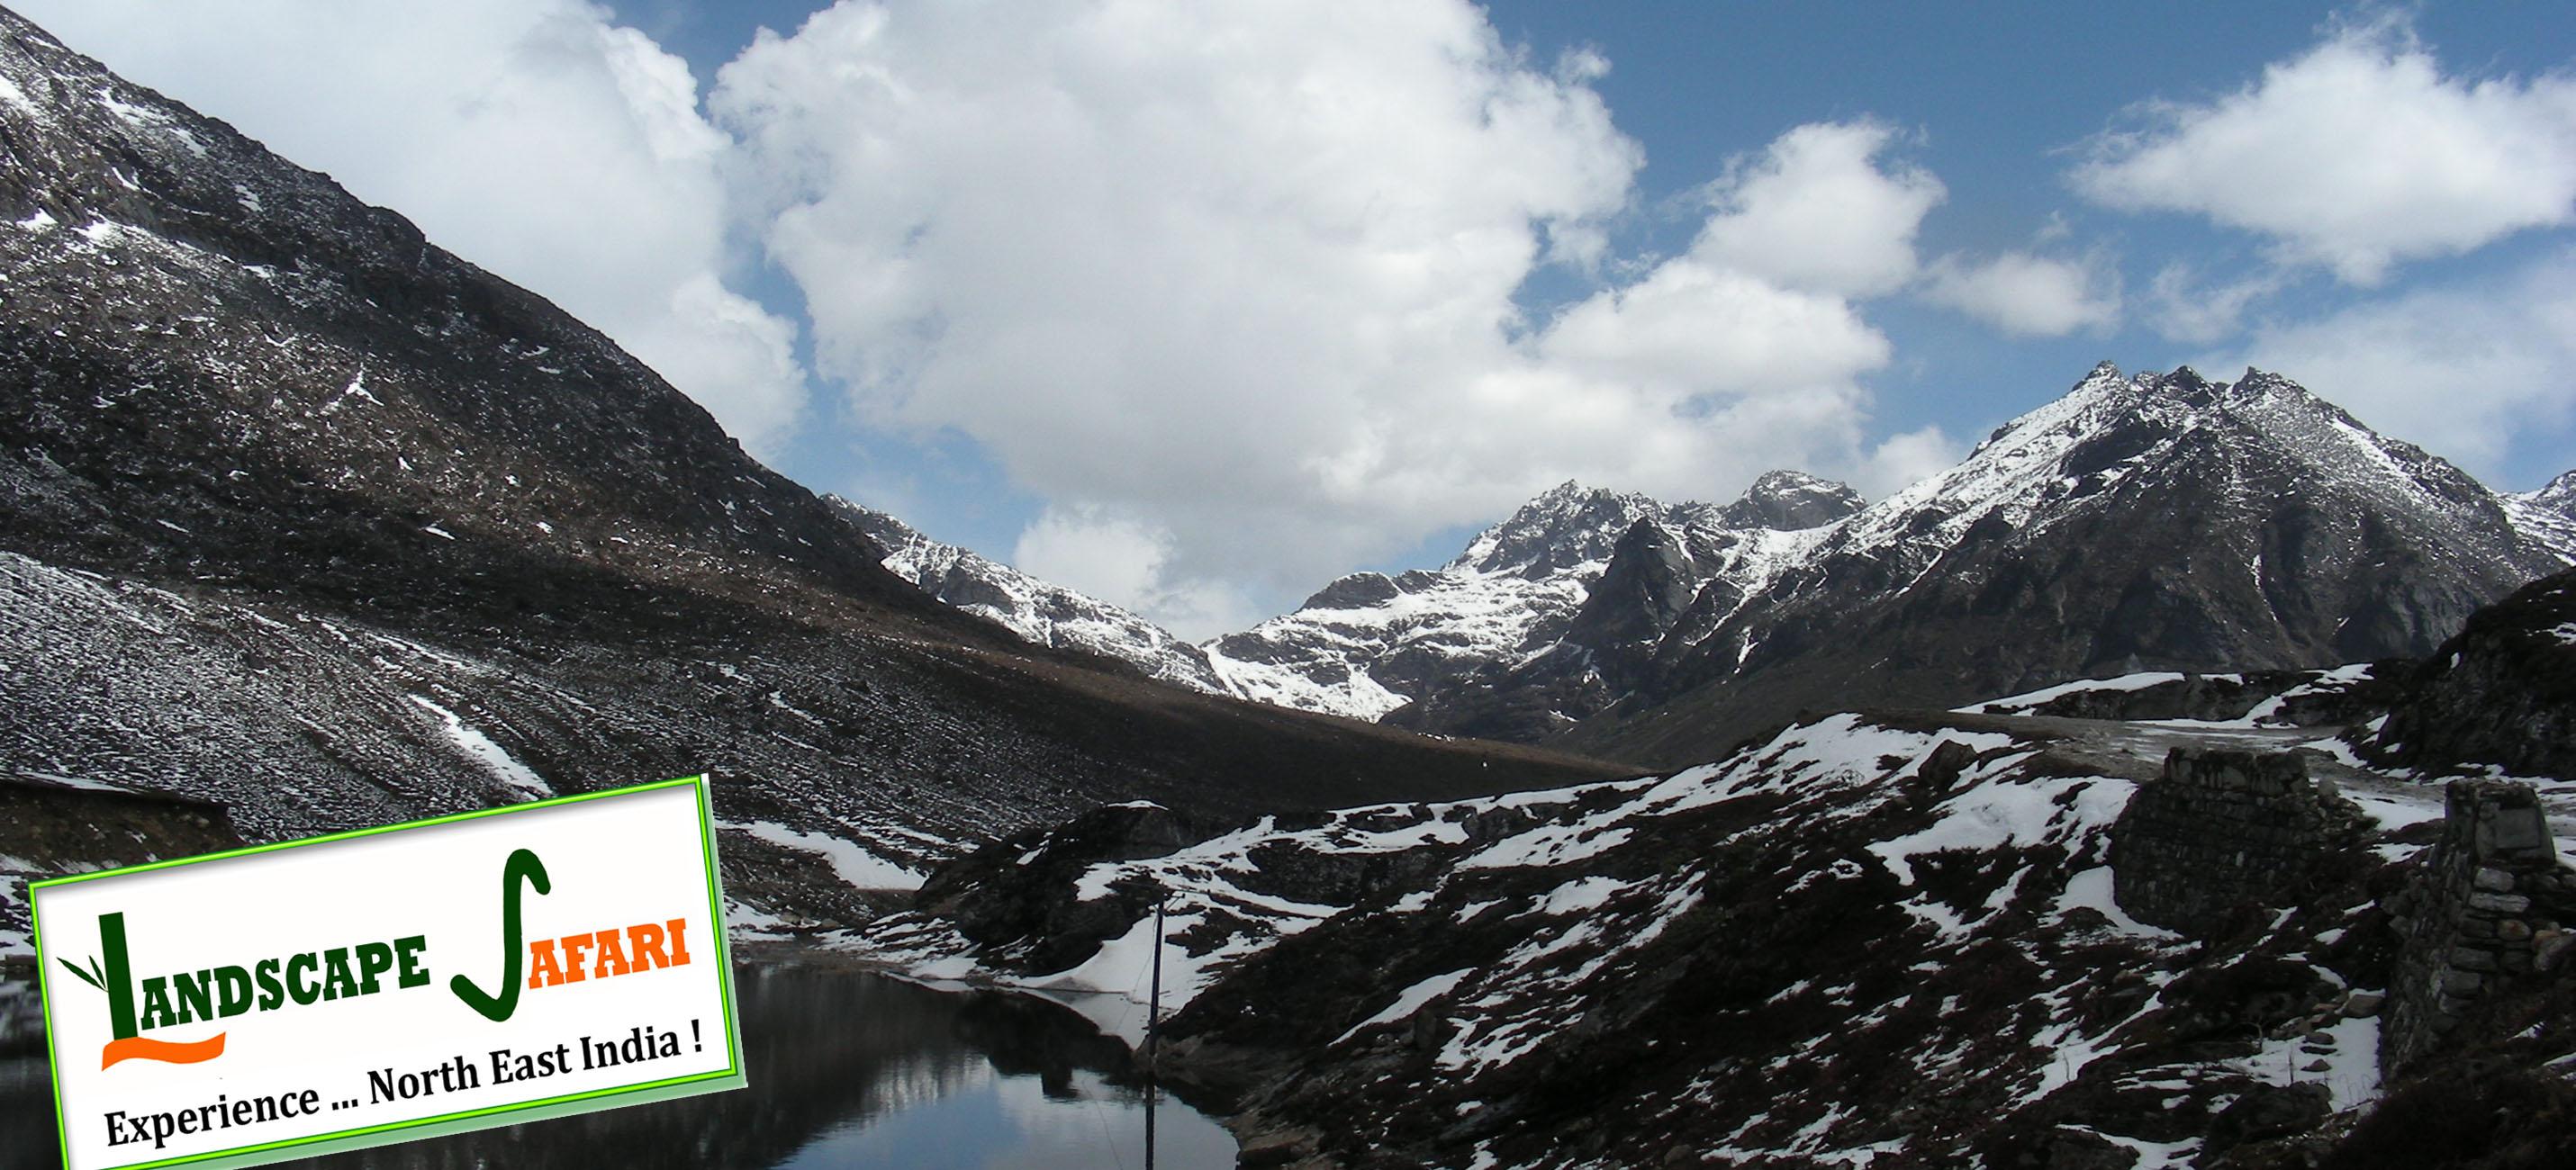 Landscape Safari: India, Bhutan, Nepal, North East India, Kaziranga ...